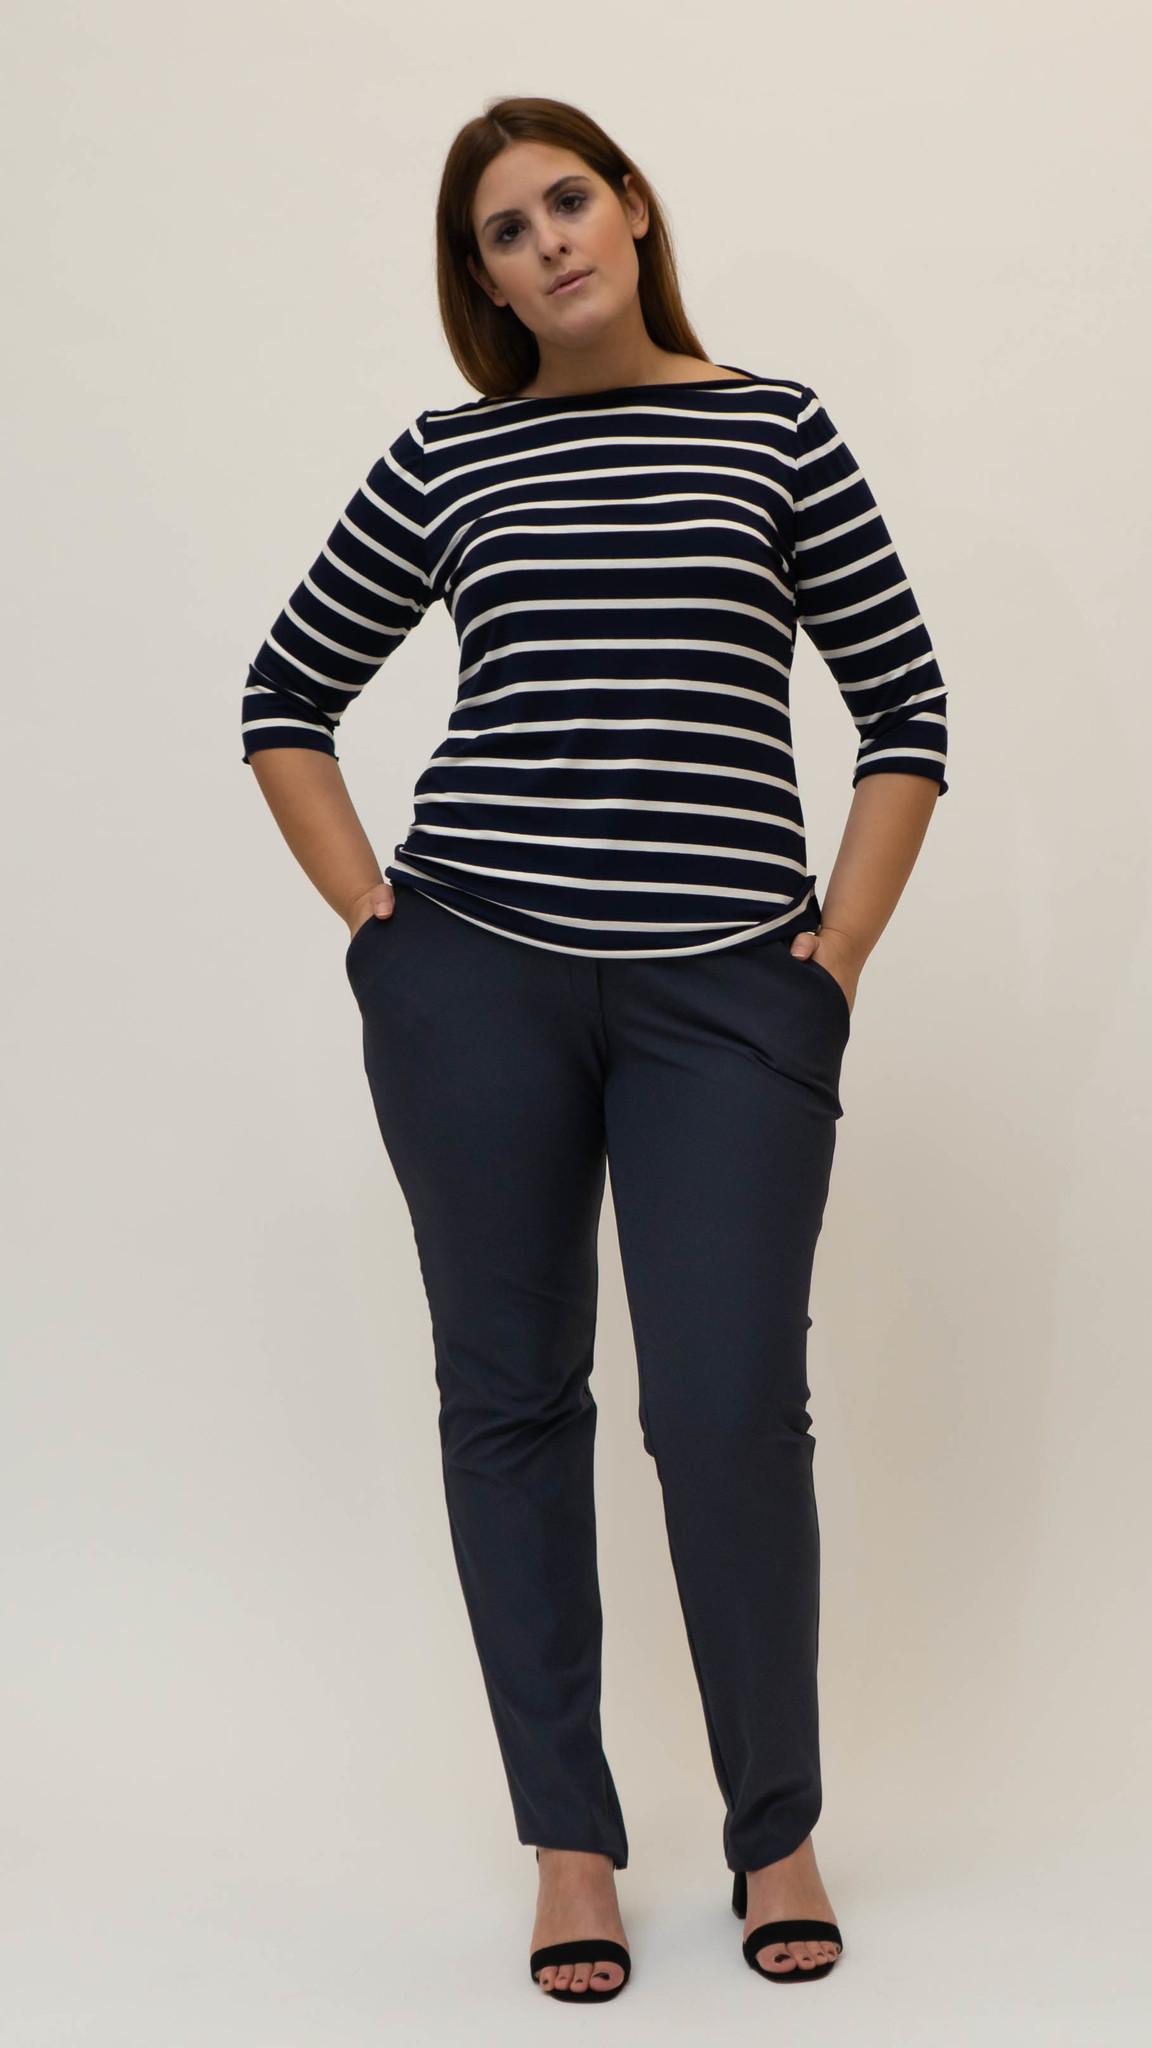 MARIETTE Shirt in Jersey-4